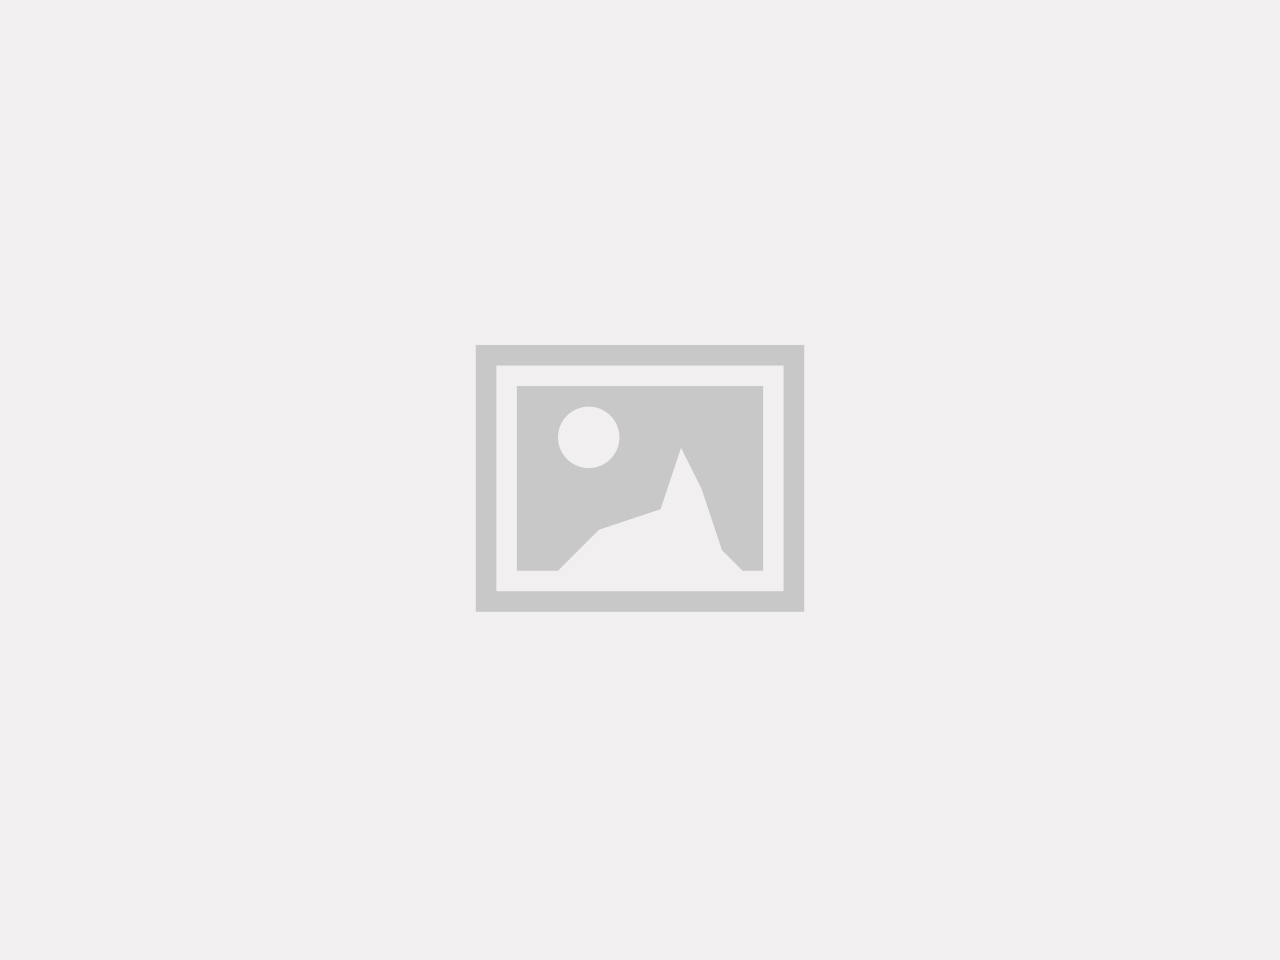 DVI / USB2.0 HDBaseT extender kit